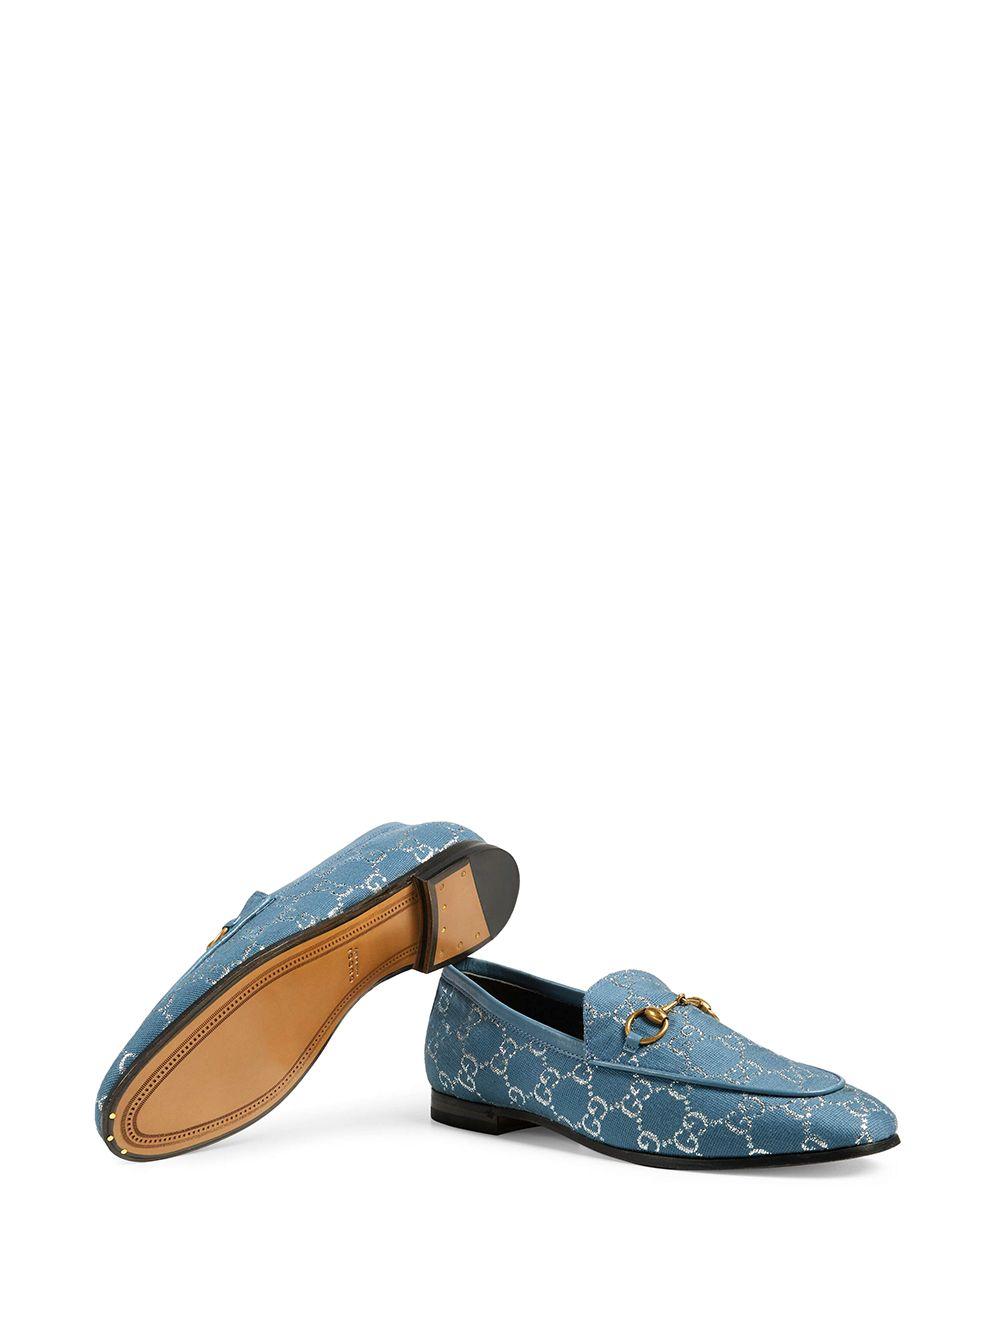 Jordan Leather Loafers